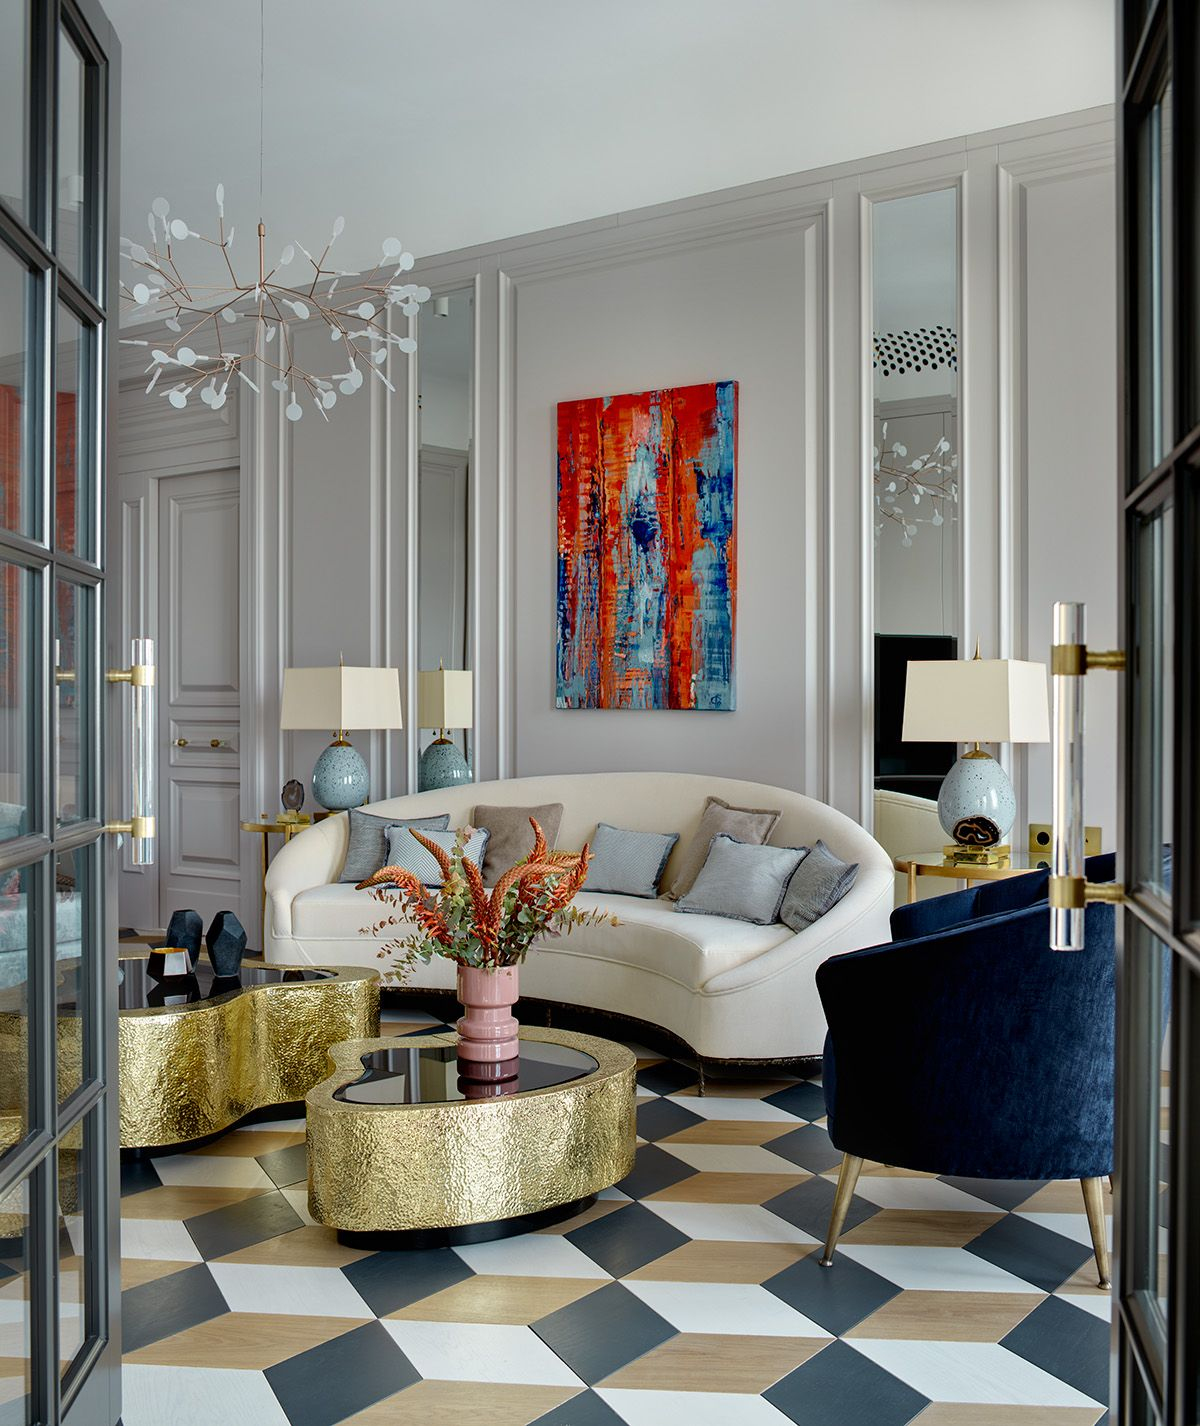 Home interior furniture koket vamp luxury sofa home design  home  pinterest  interior